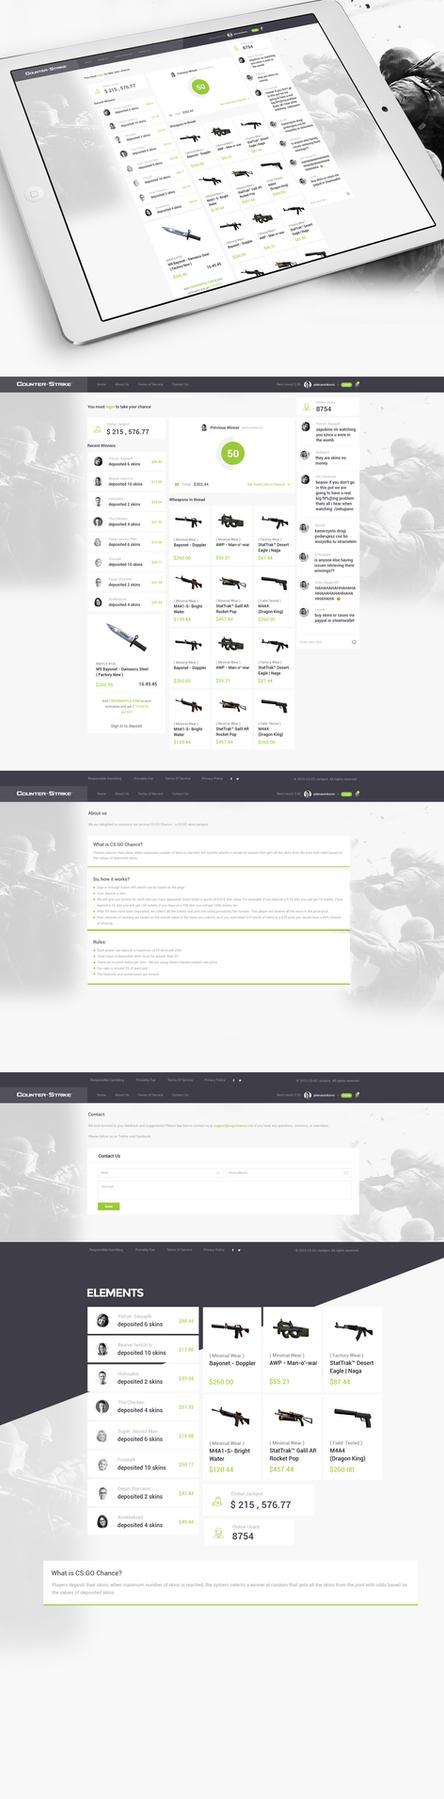 CS Gochance Jackpot Web Desing by vasiligfx